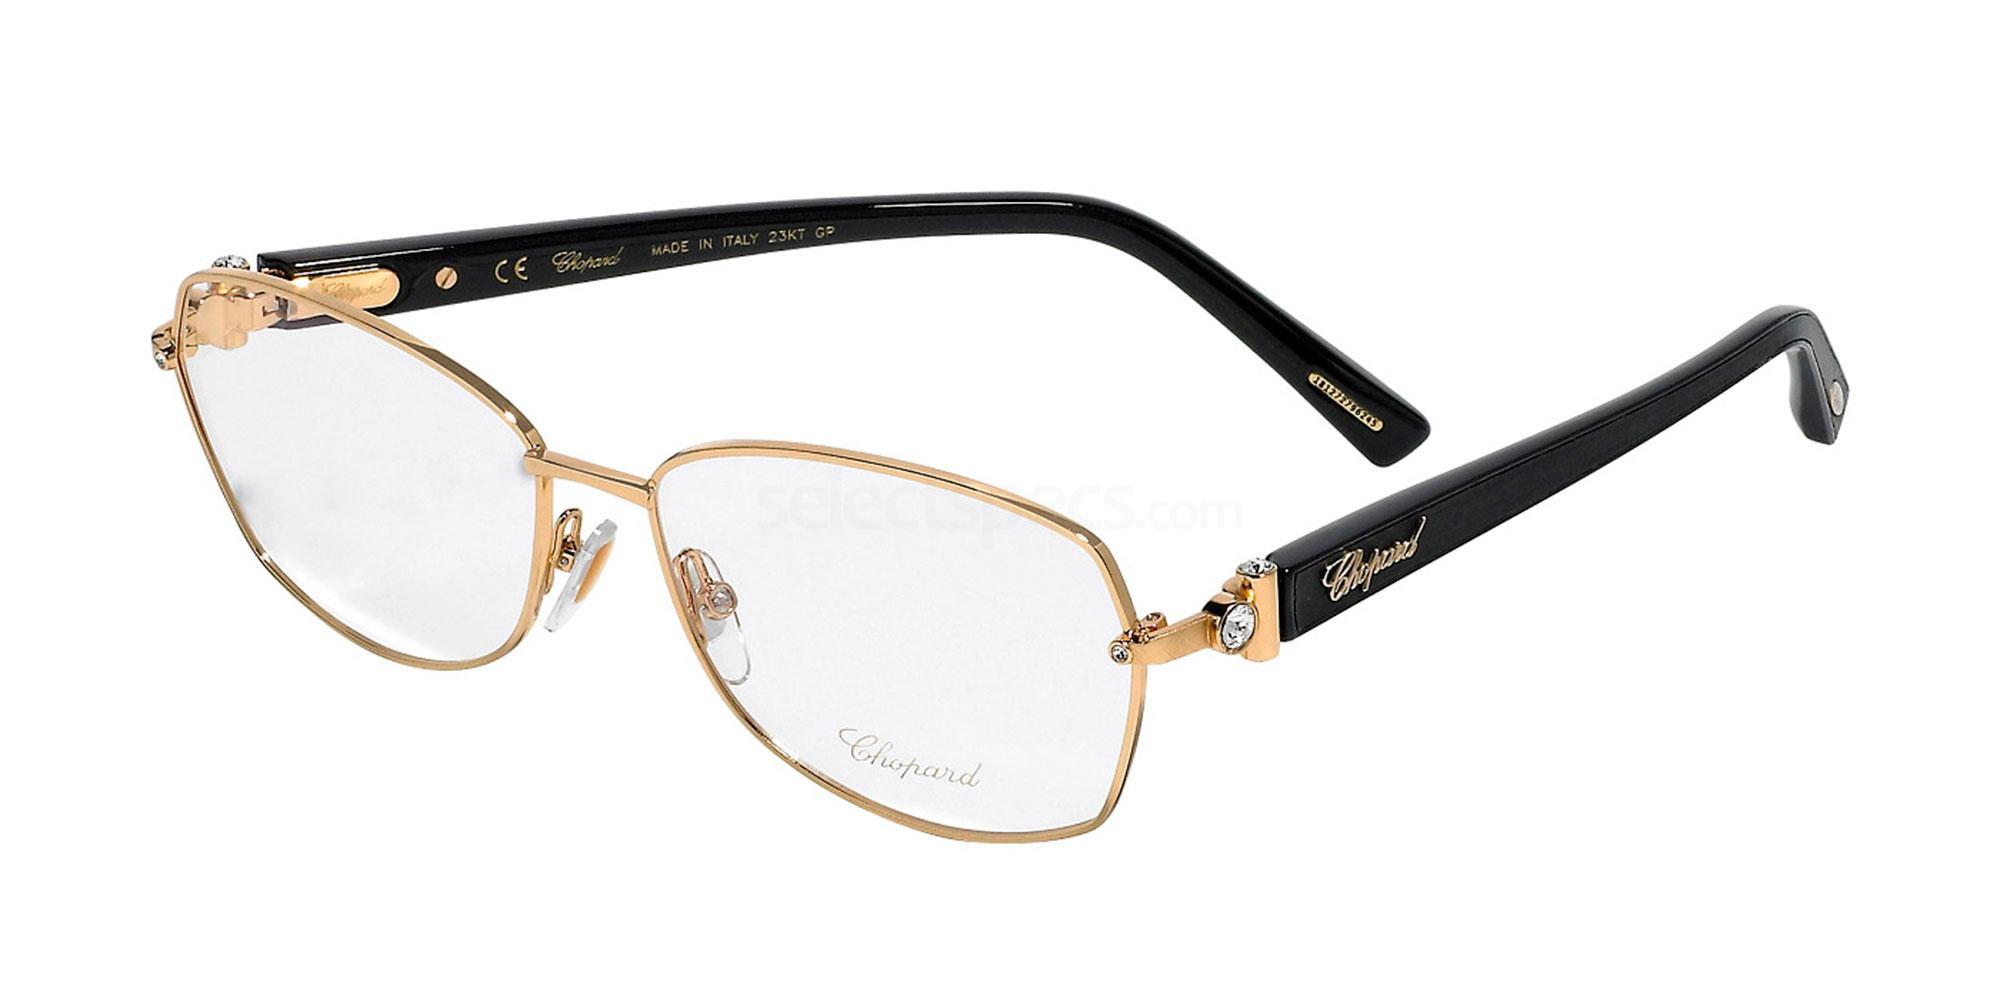 0300 VCHD14S Glasses, Chopard